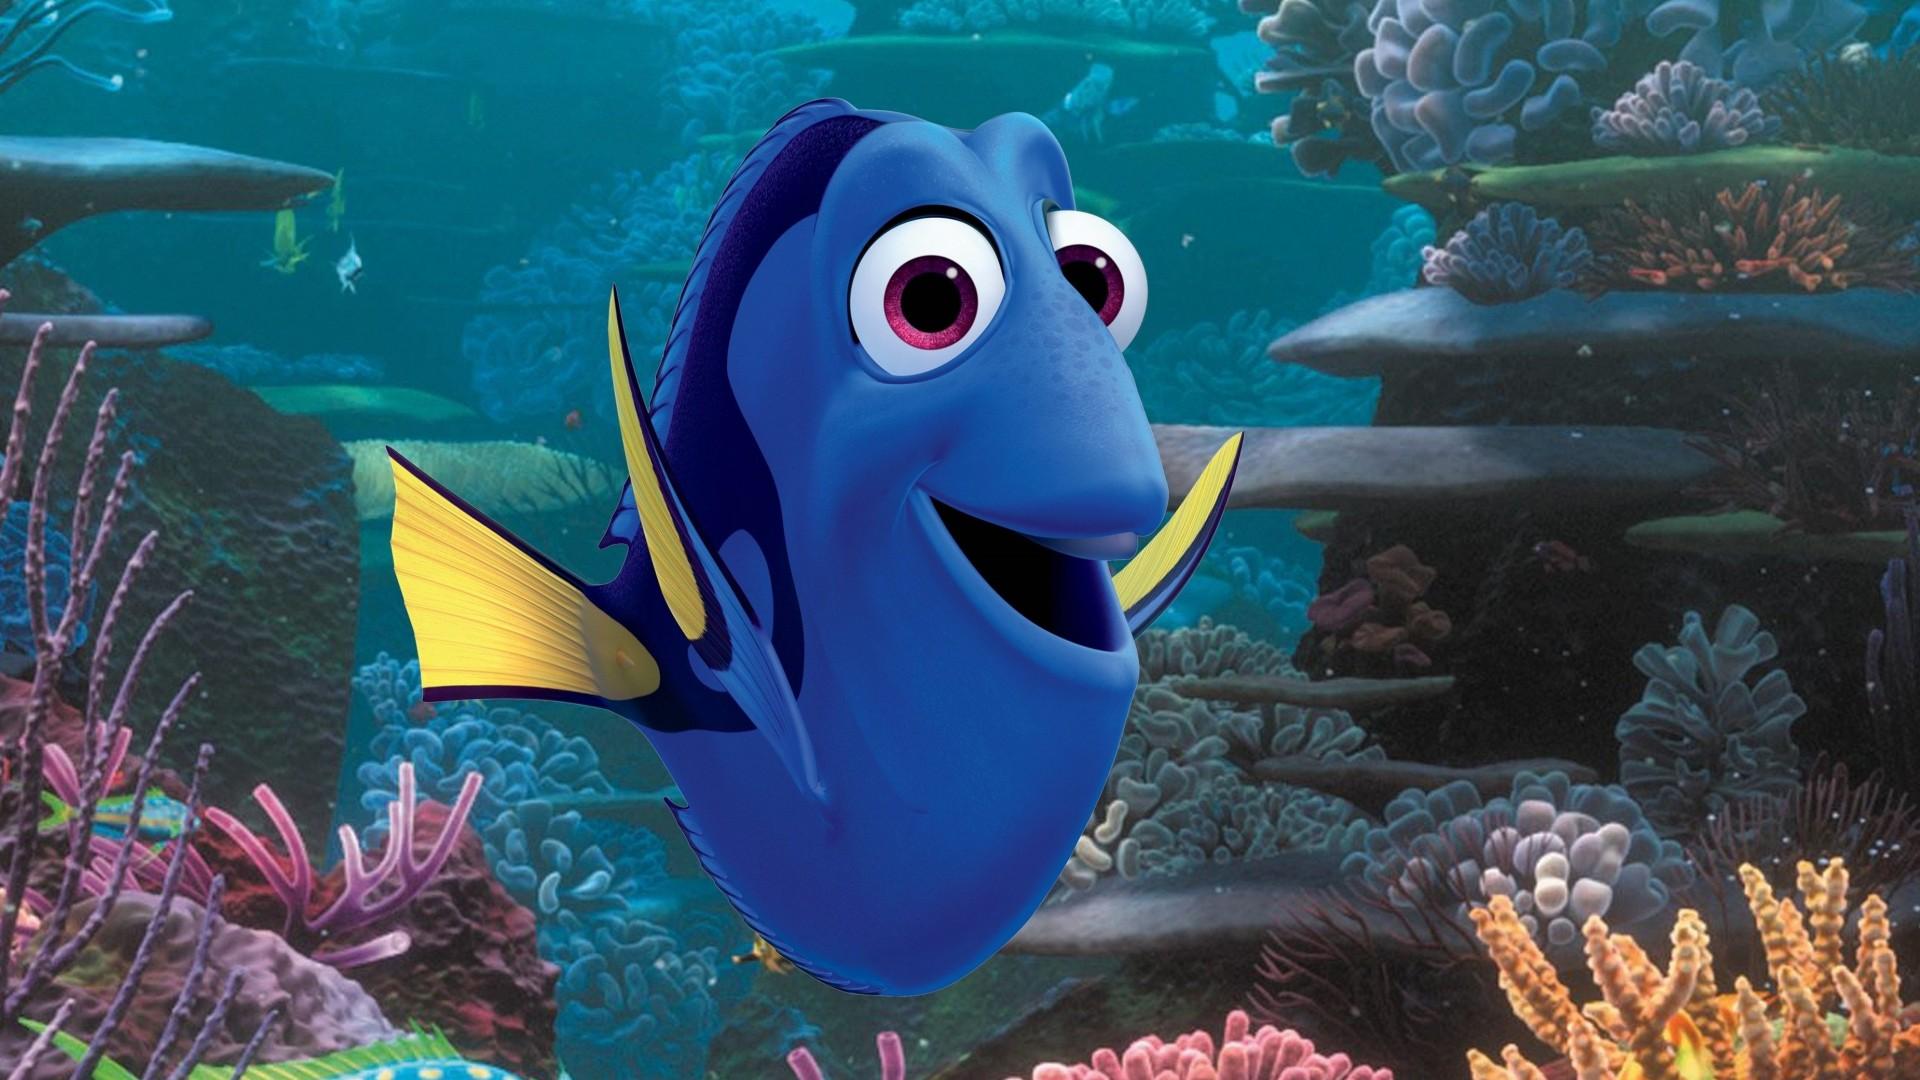 Wallpaper Finding Dory Nemo Fish Pixar Animation Movies 8014